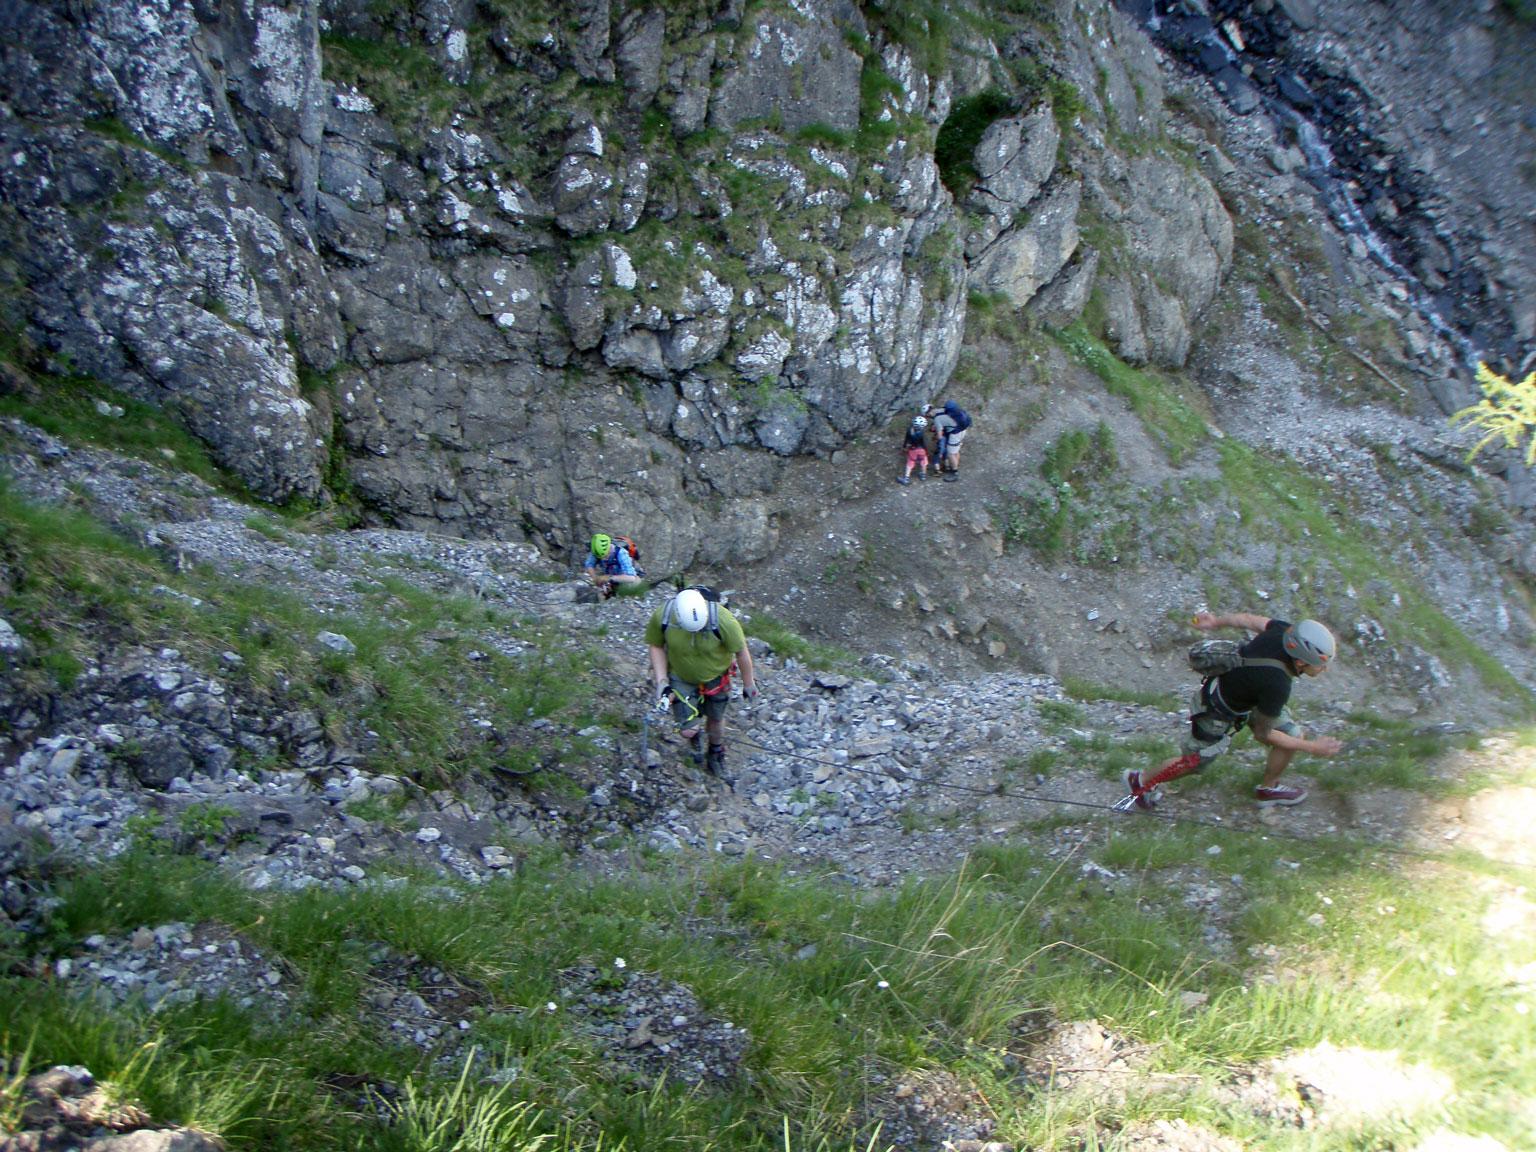 Klettersteig Engstligenalp : Berghotel engstligenalp bewertungen fotos adelboden schweiz